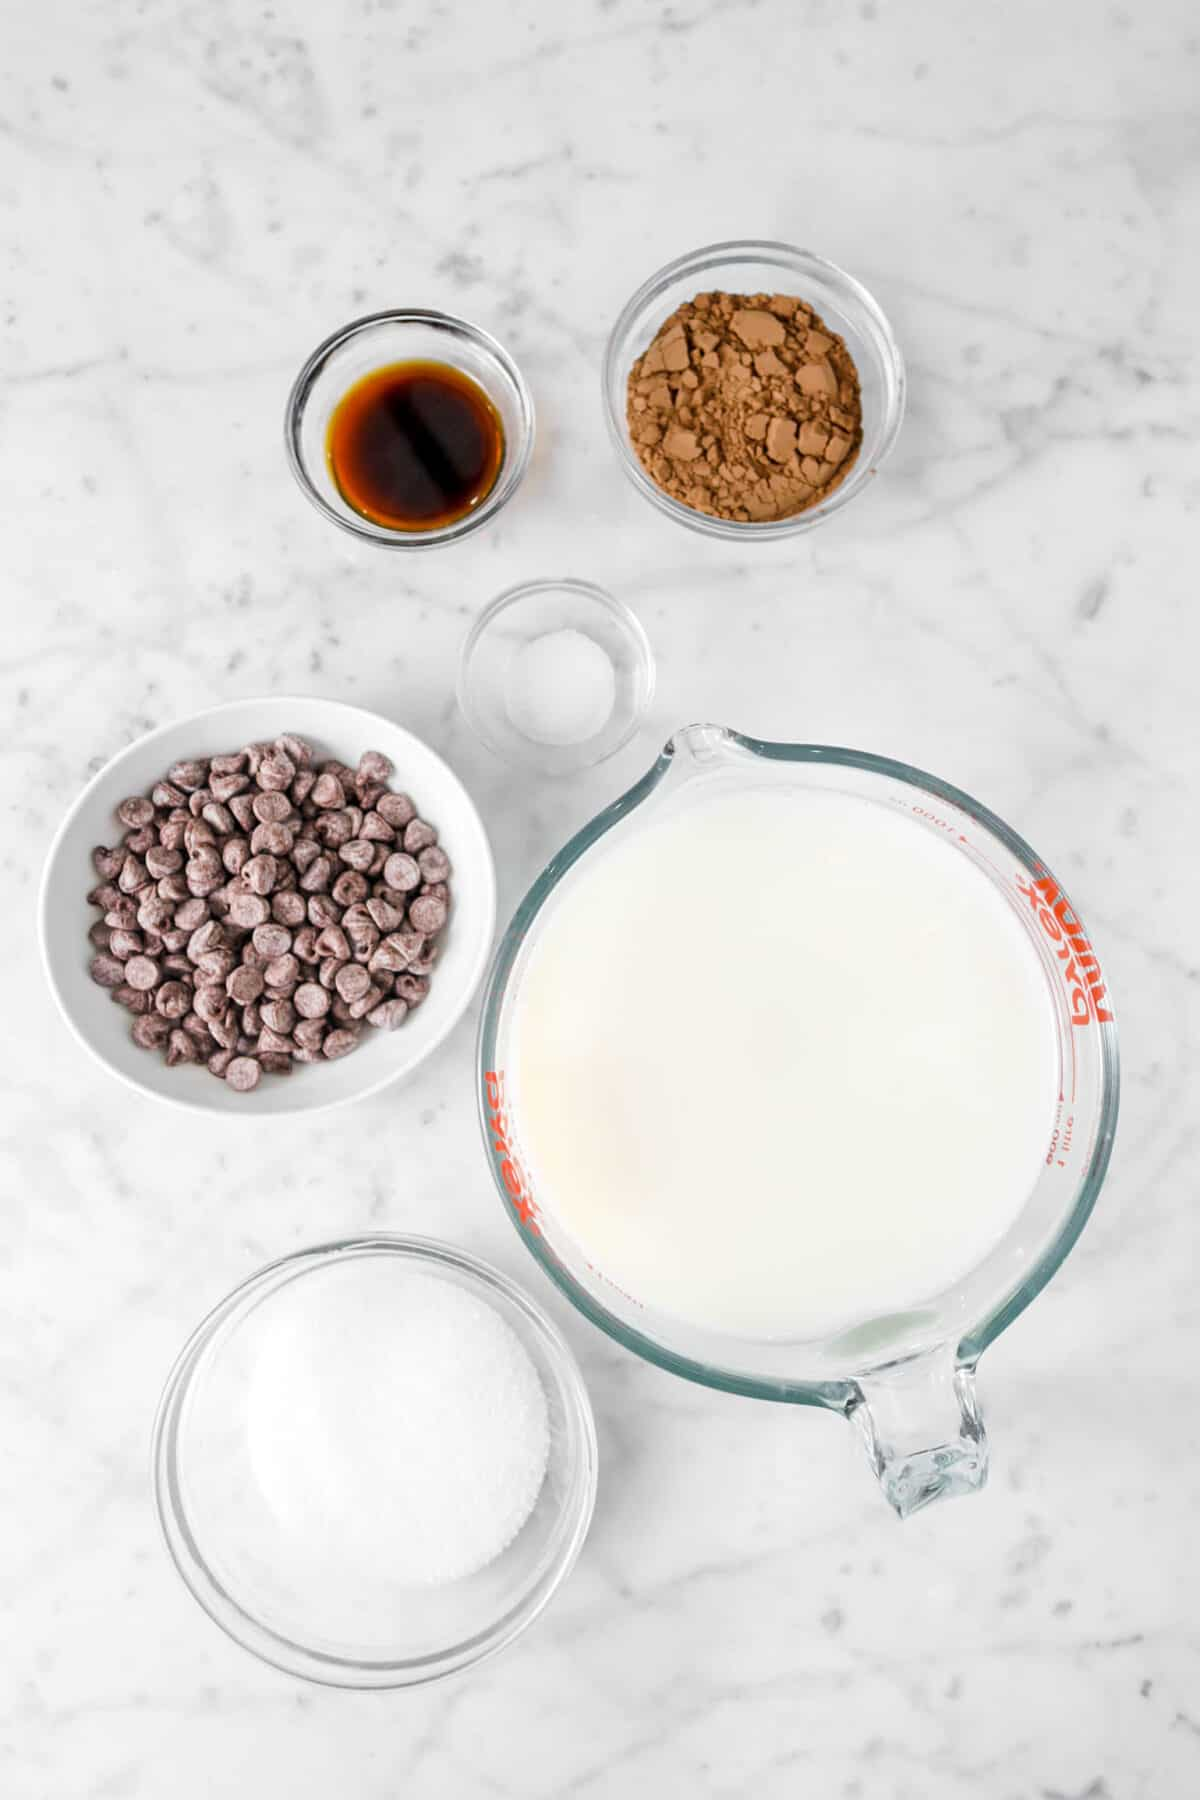 cocoa powder, vanilla, salt, chocolate chips, milk, and sugar in glass bowls